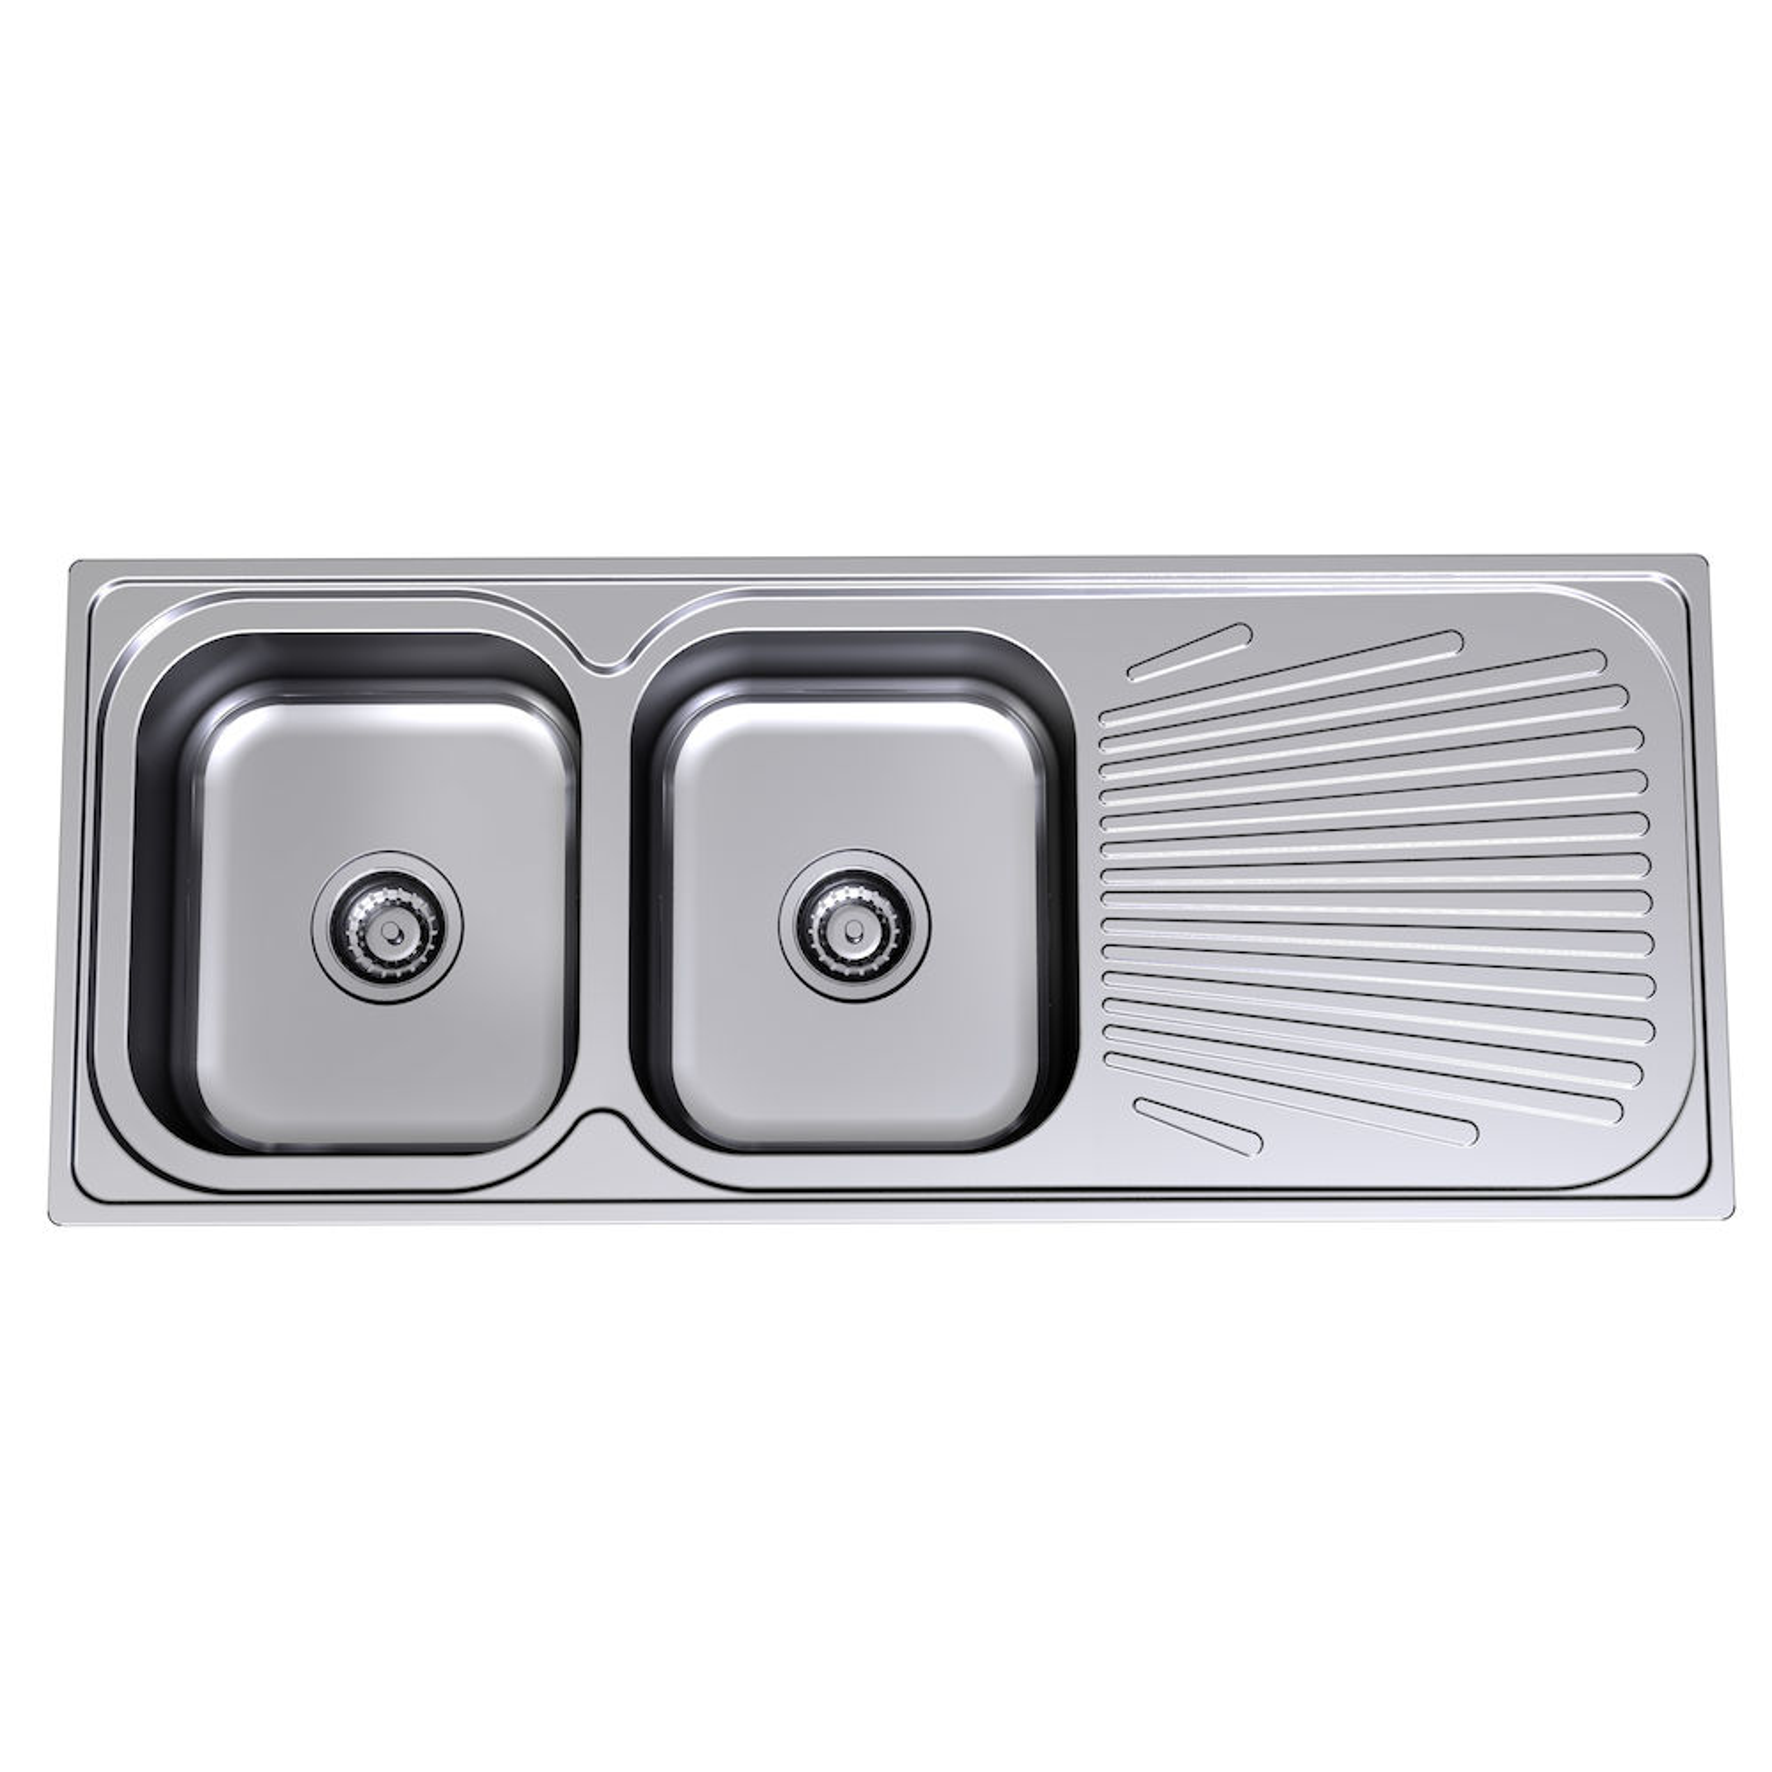 Admirable Vital Double Left Hand End Bowl 1 Tap Hole Clark Download Free Architecture Designs Osuribritishbridgeorg